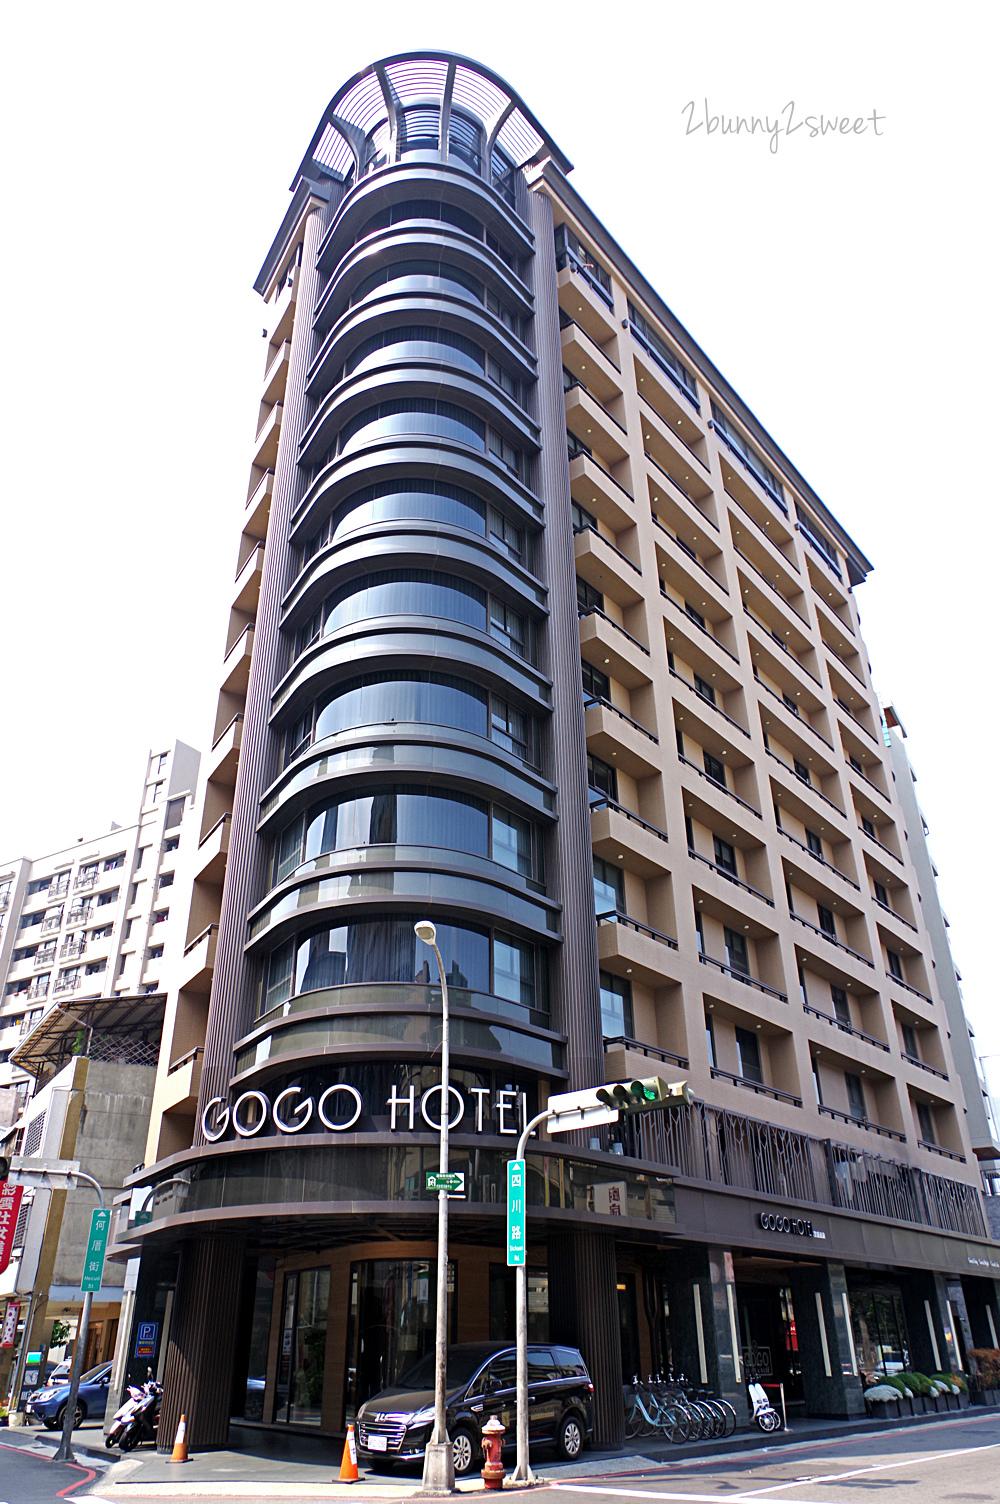 2018-1005-GOGO Hotel 市政館-01.jpg